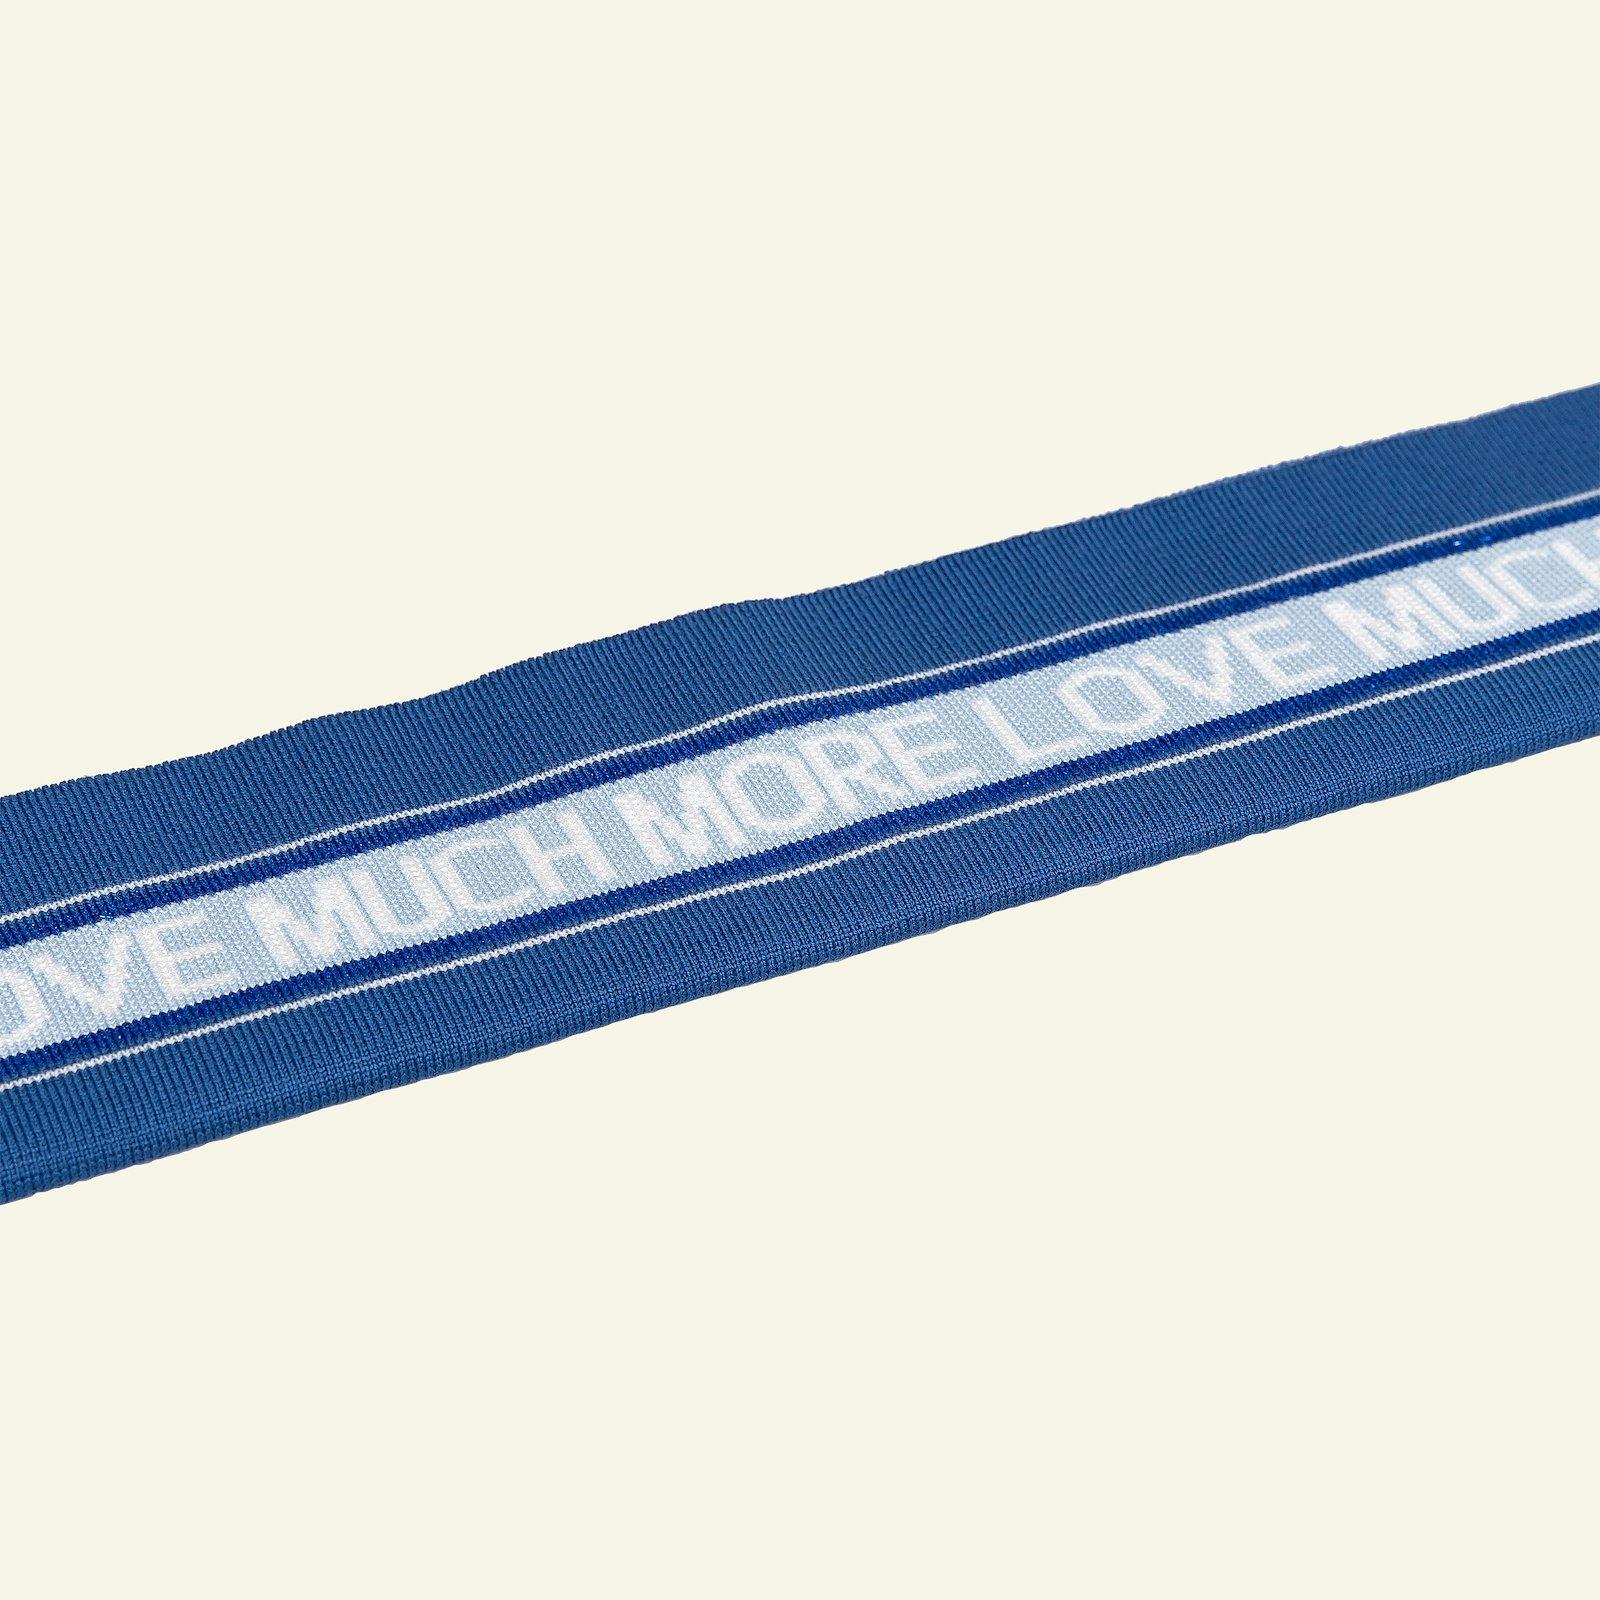 1x1 rib fold 14x100cm blue 1pc 96188_pack_b